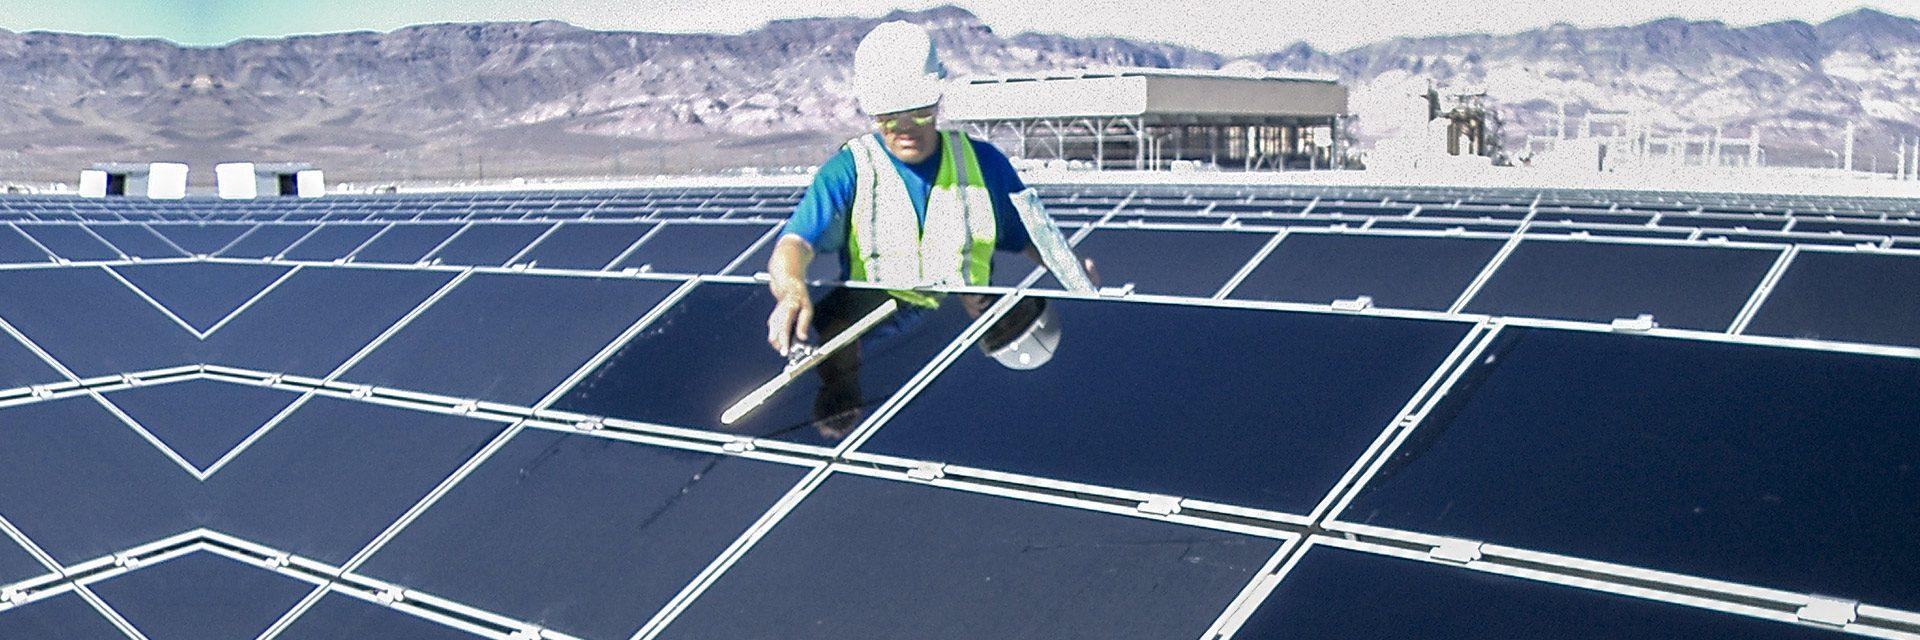 las-vegas-solar-panel-cleaning